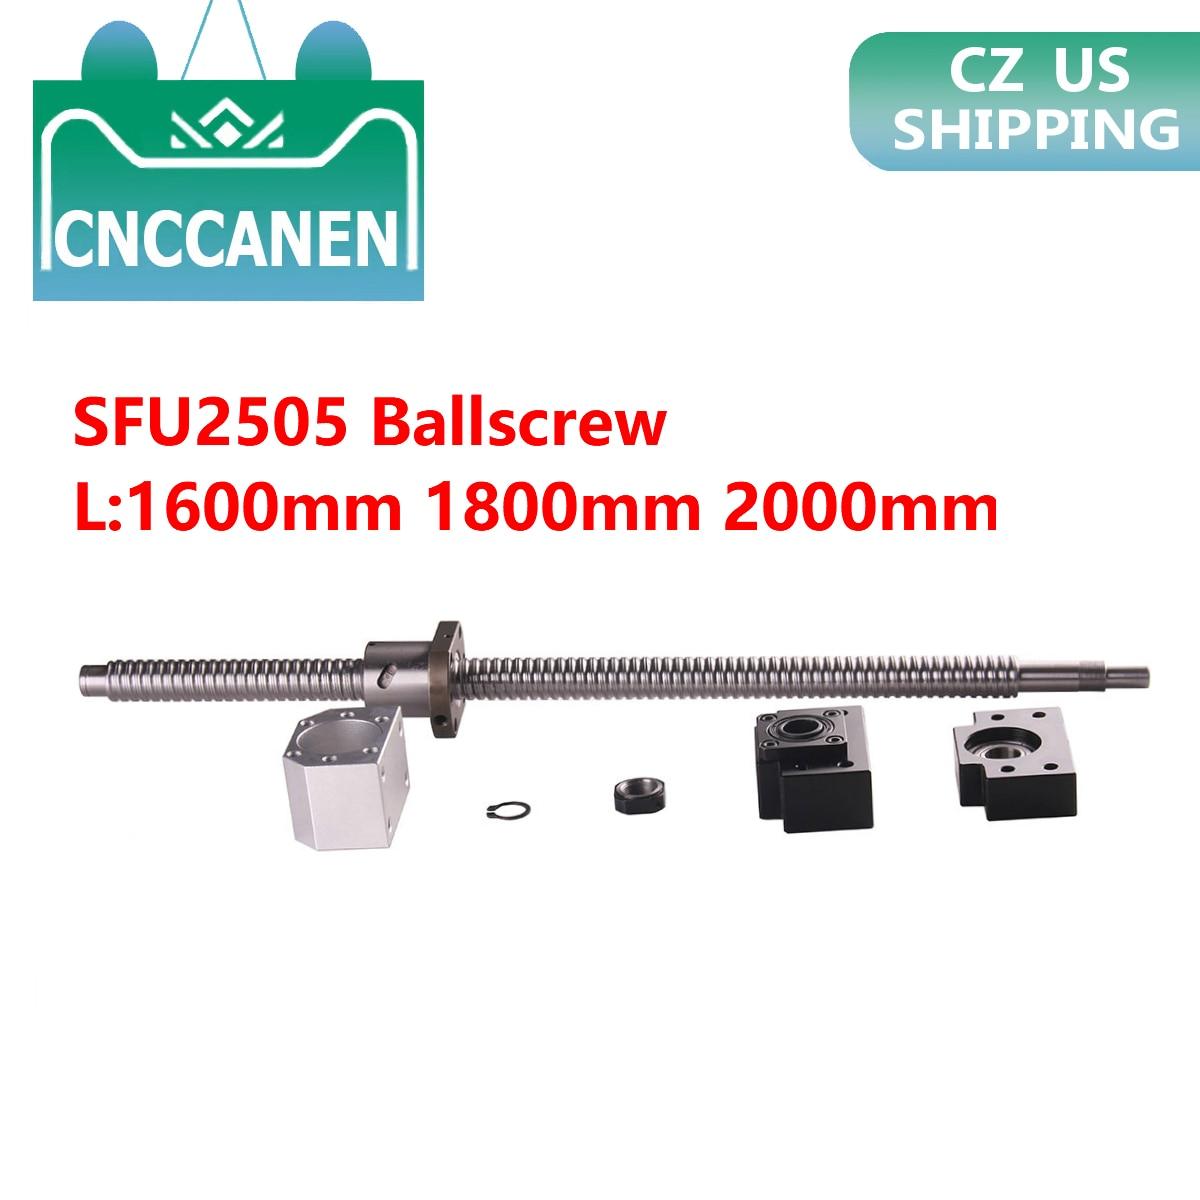 SFU2505 Ballscrew نهاية تشكيله مع الجوز طول 1600 مللي متر 1800 2000 مللي متر و BK/BF20 دعم و DSG25H الجوز الإسكان CNC راوتر تشكيله